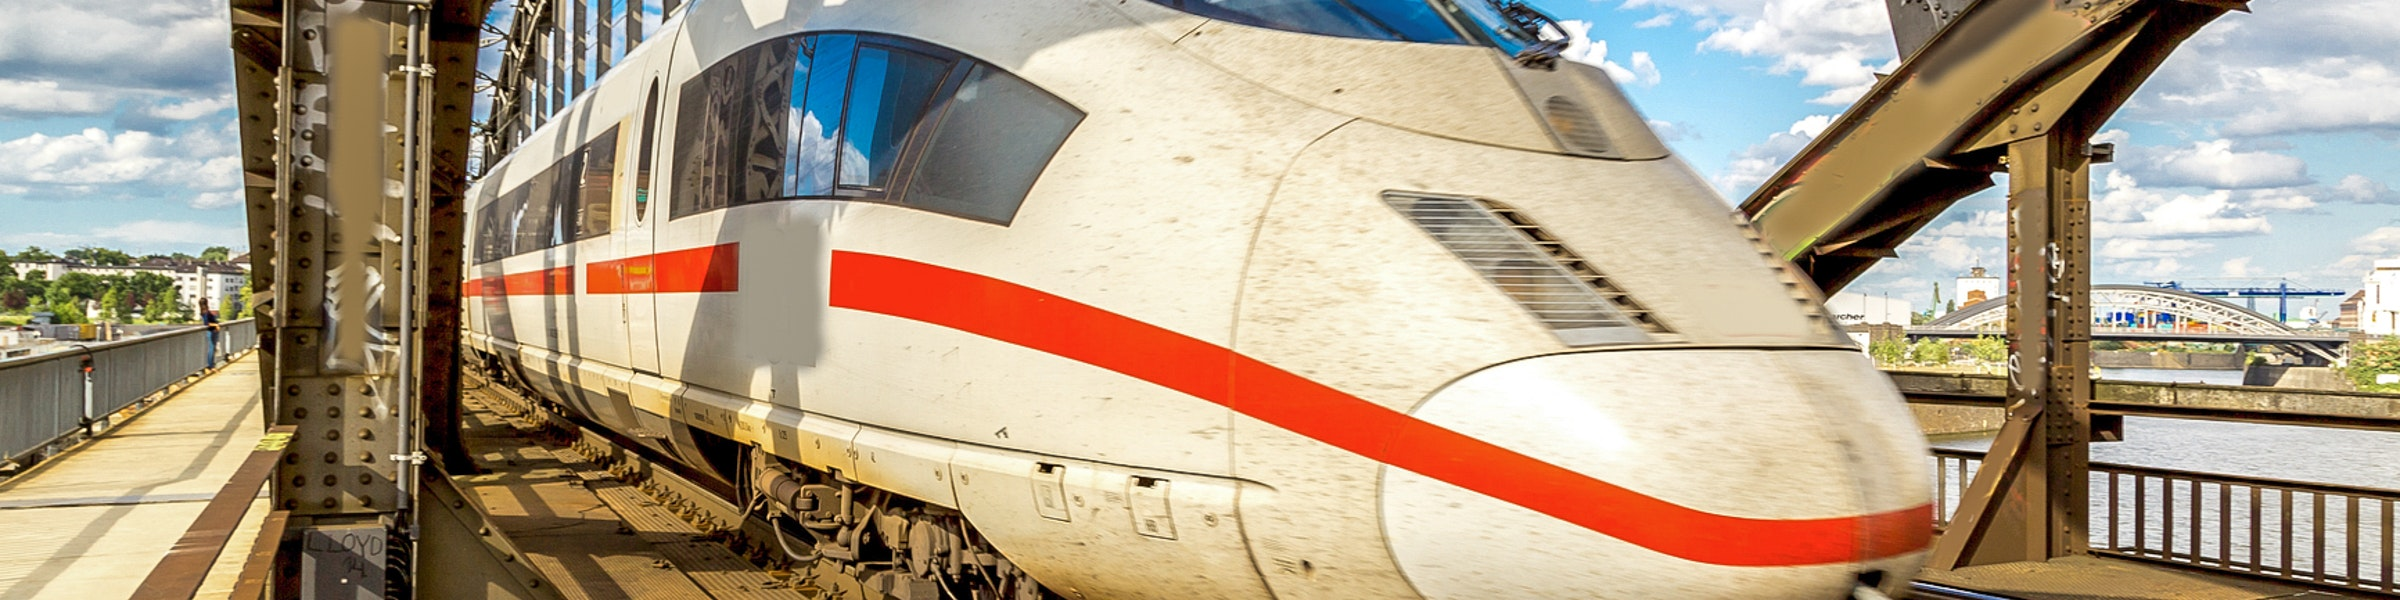 InterCity Express in Frankfurt